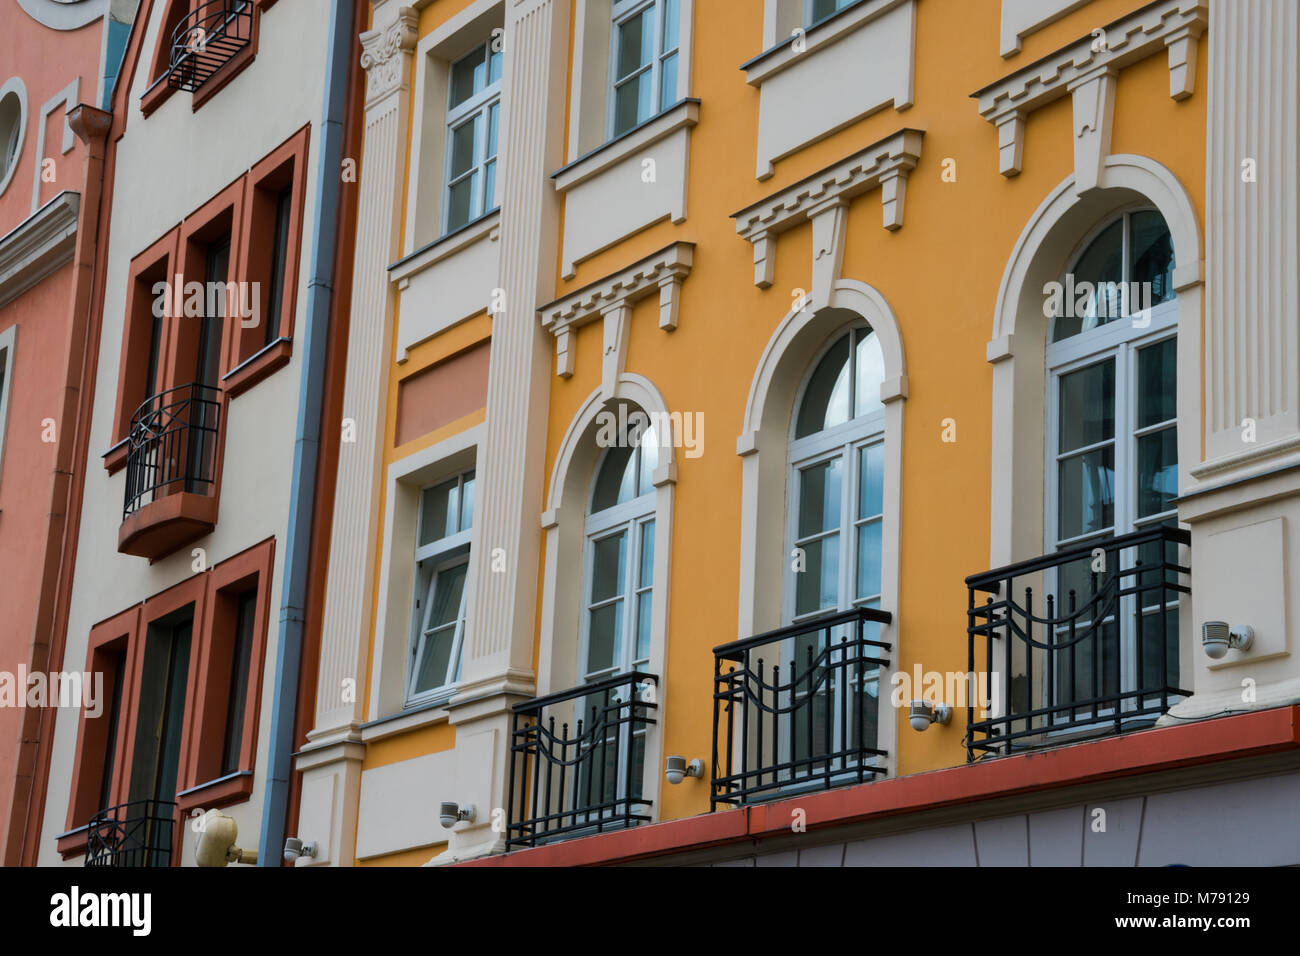 Old building facade in Riga, Latvia. - Stock Image